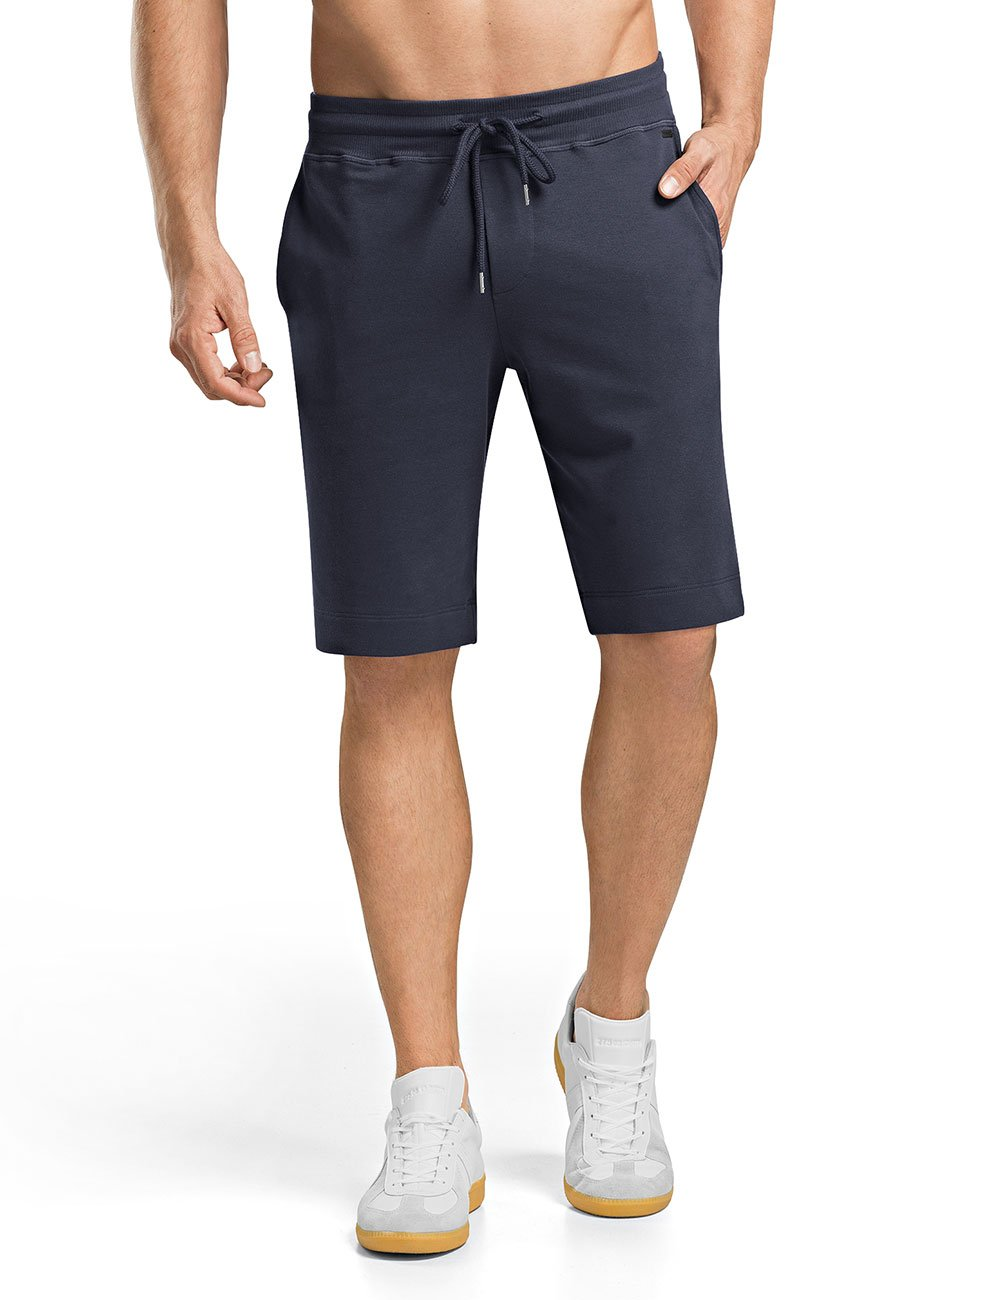 Hanro Men's Living Short Lounge Pant, Black Iris, Medium by HANRO (Image #1)